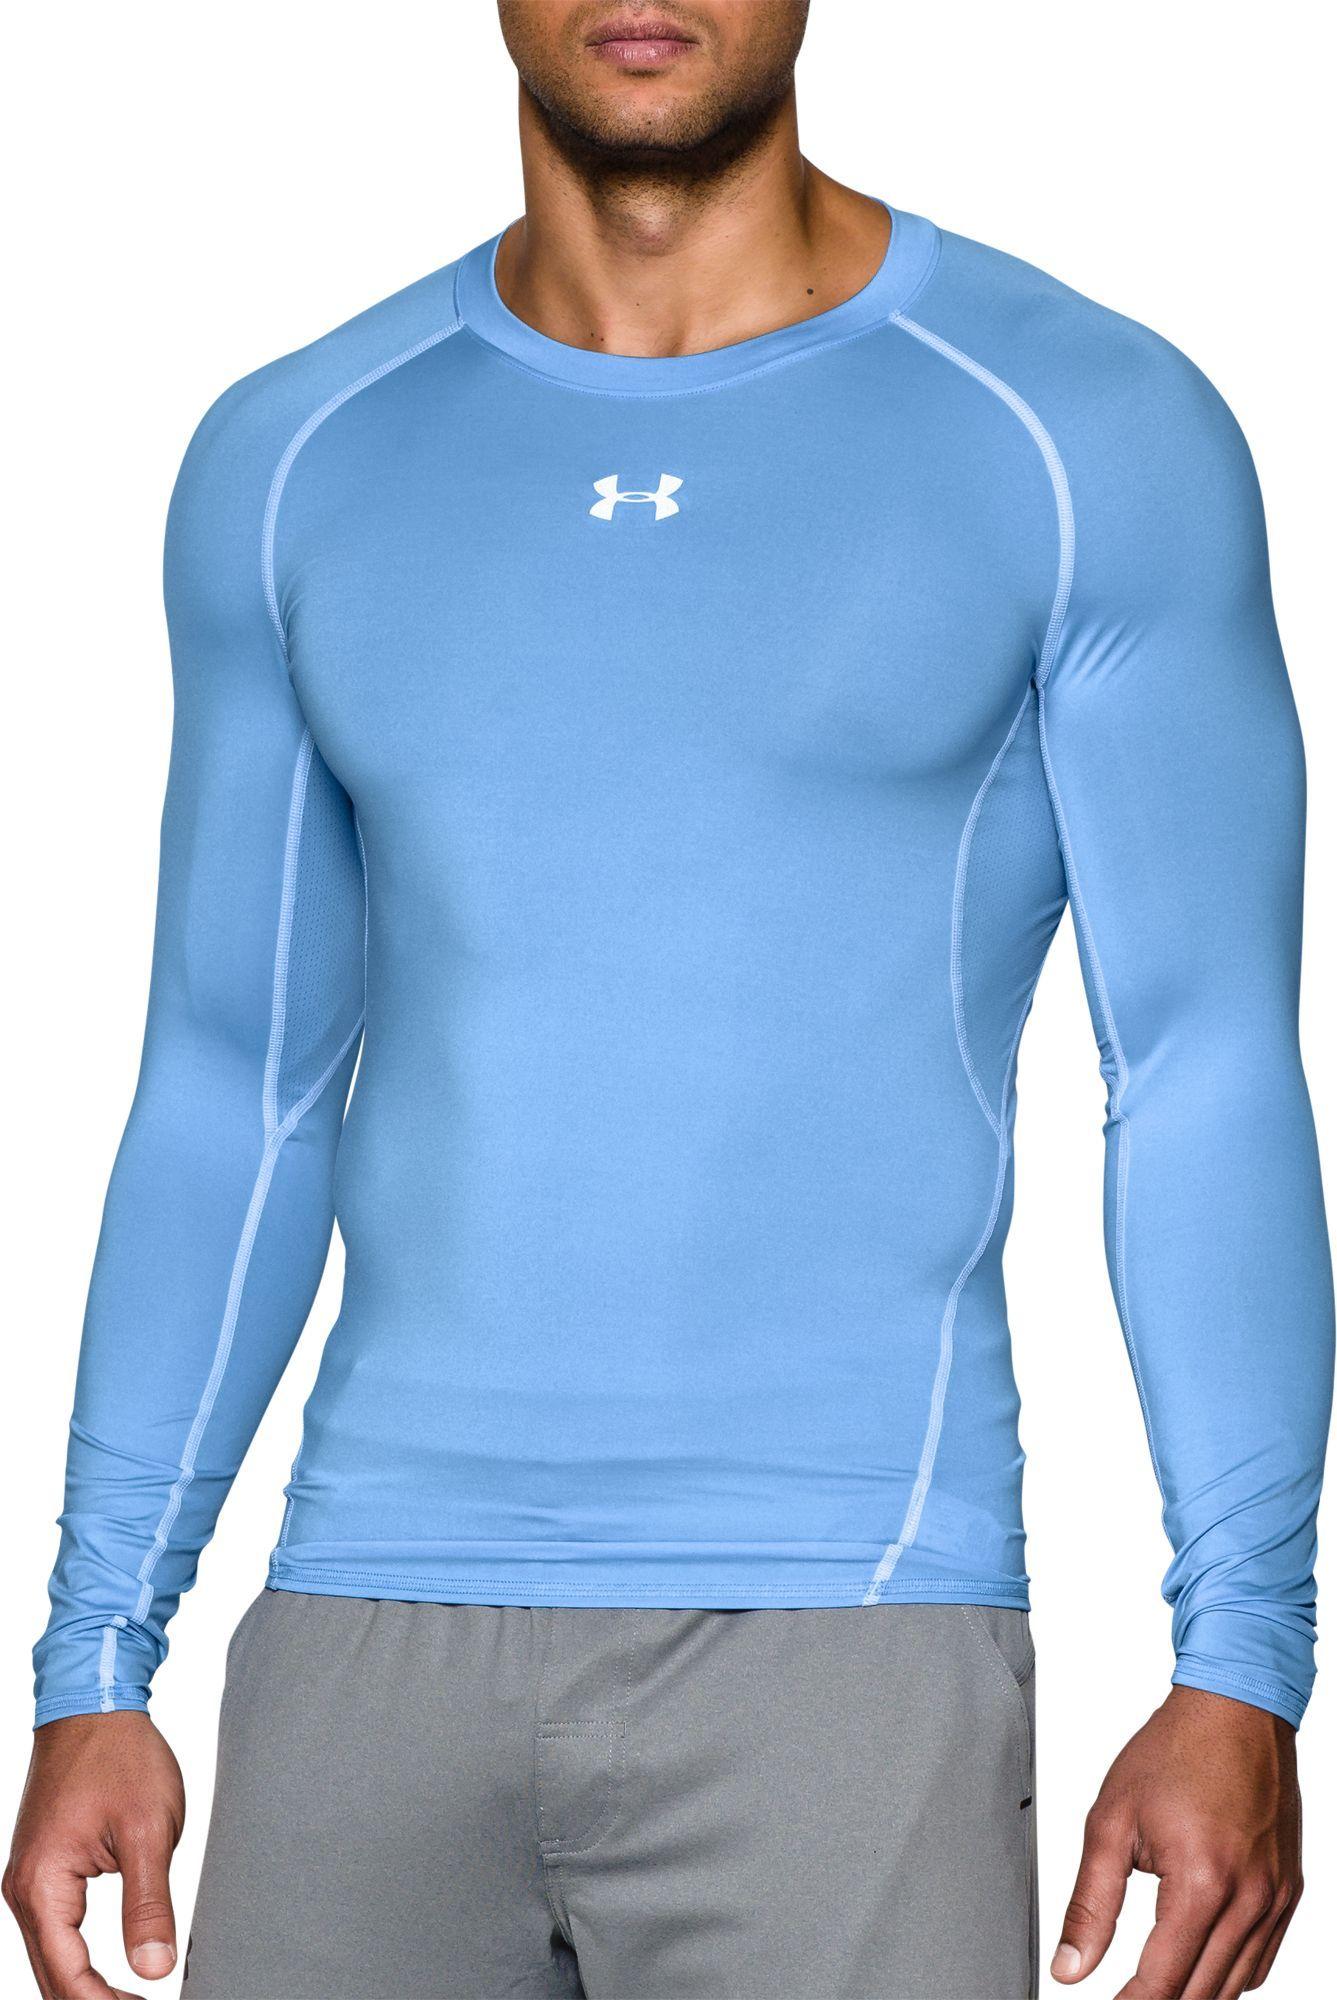 08f49fe60d Under Armour Men's HeatGear Armour Long Sleeve T-Shirt | Products ...